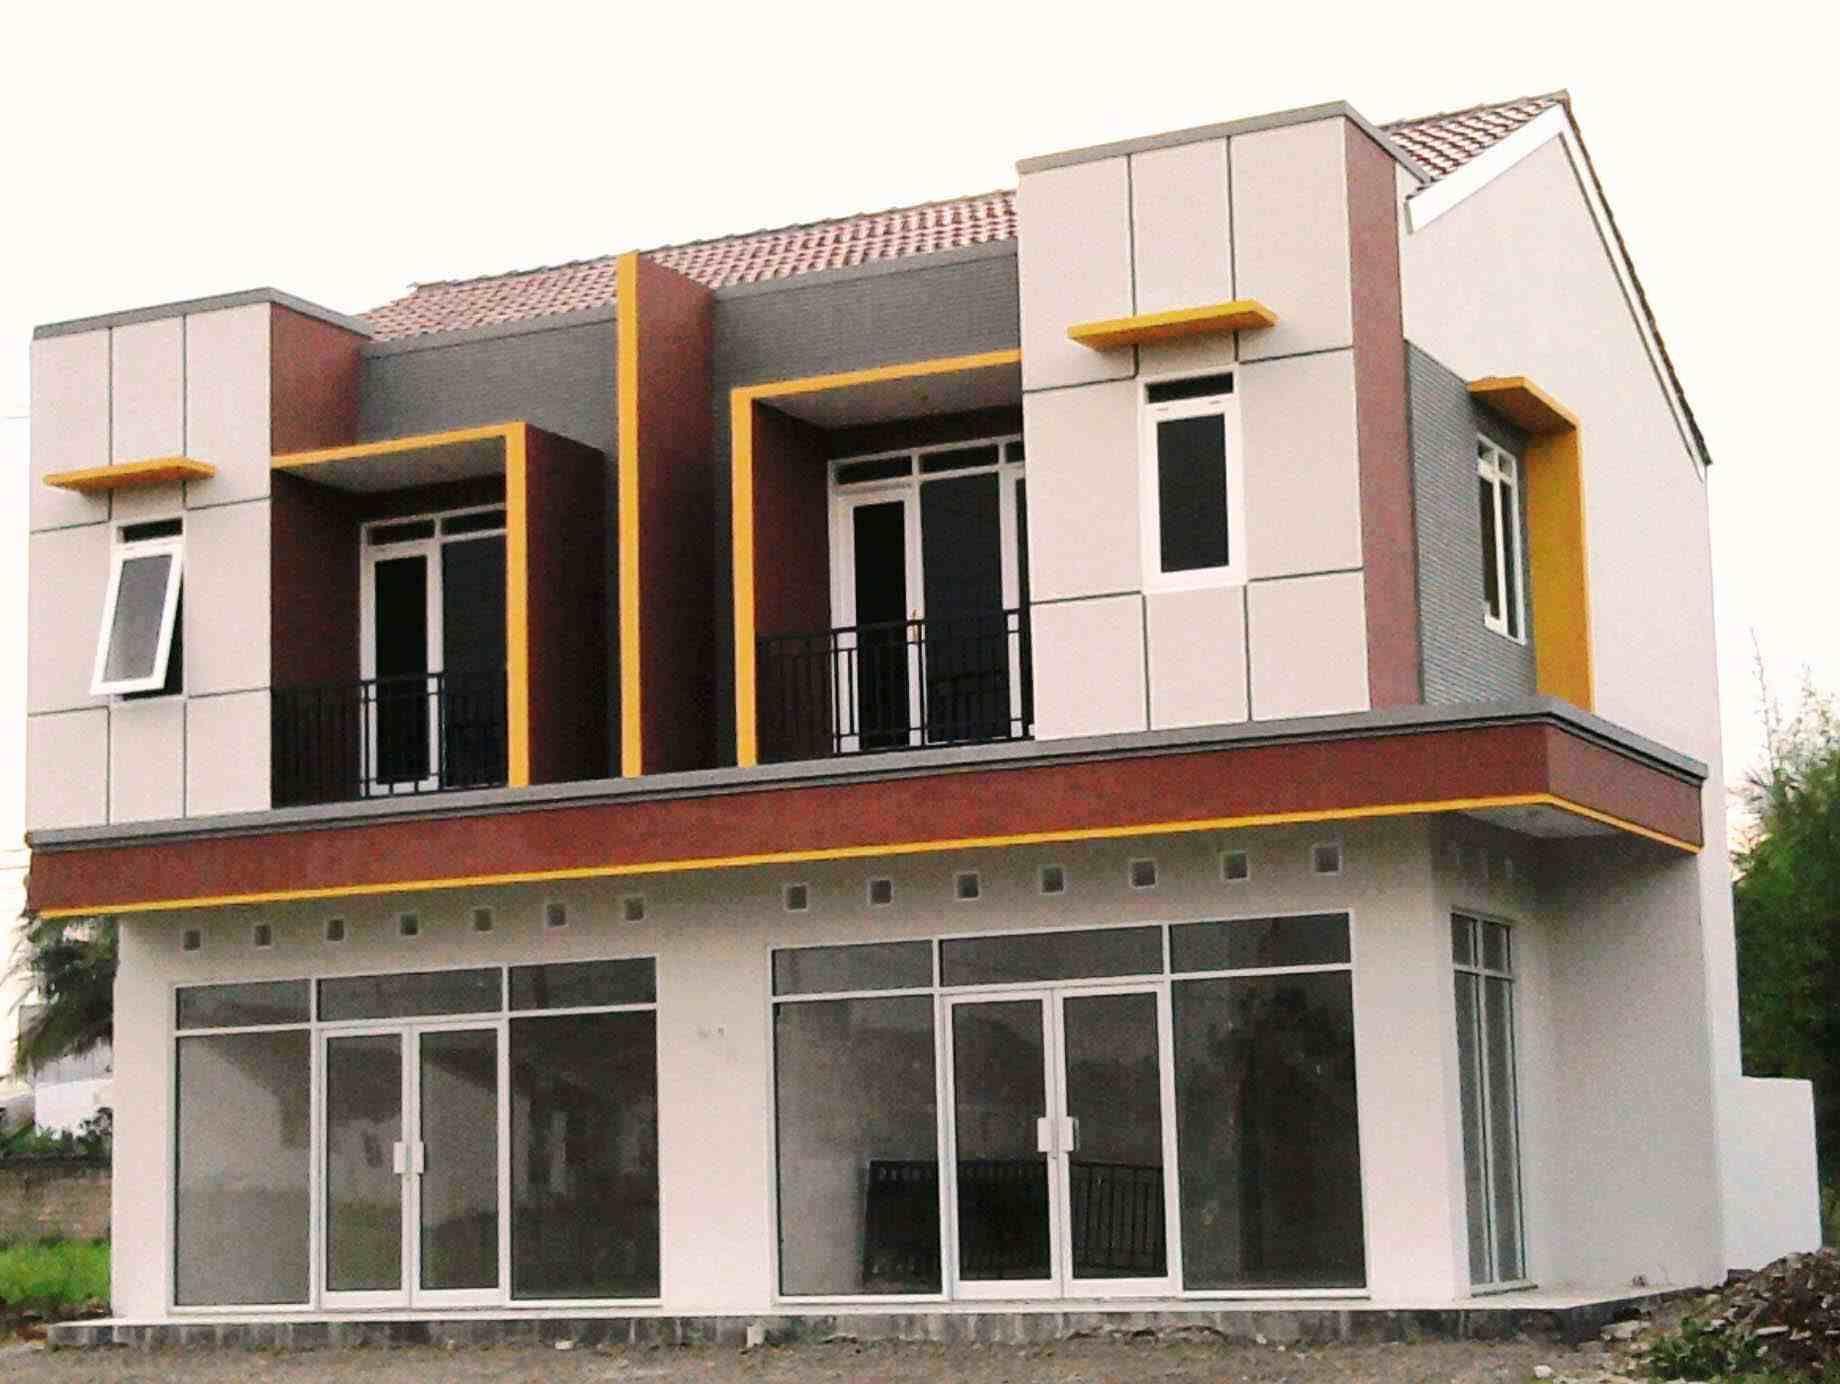 Foto Ruko Minimalis 2 Lantai Desain Eksterior Arsitektur Ruko